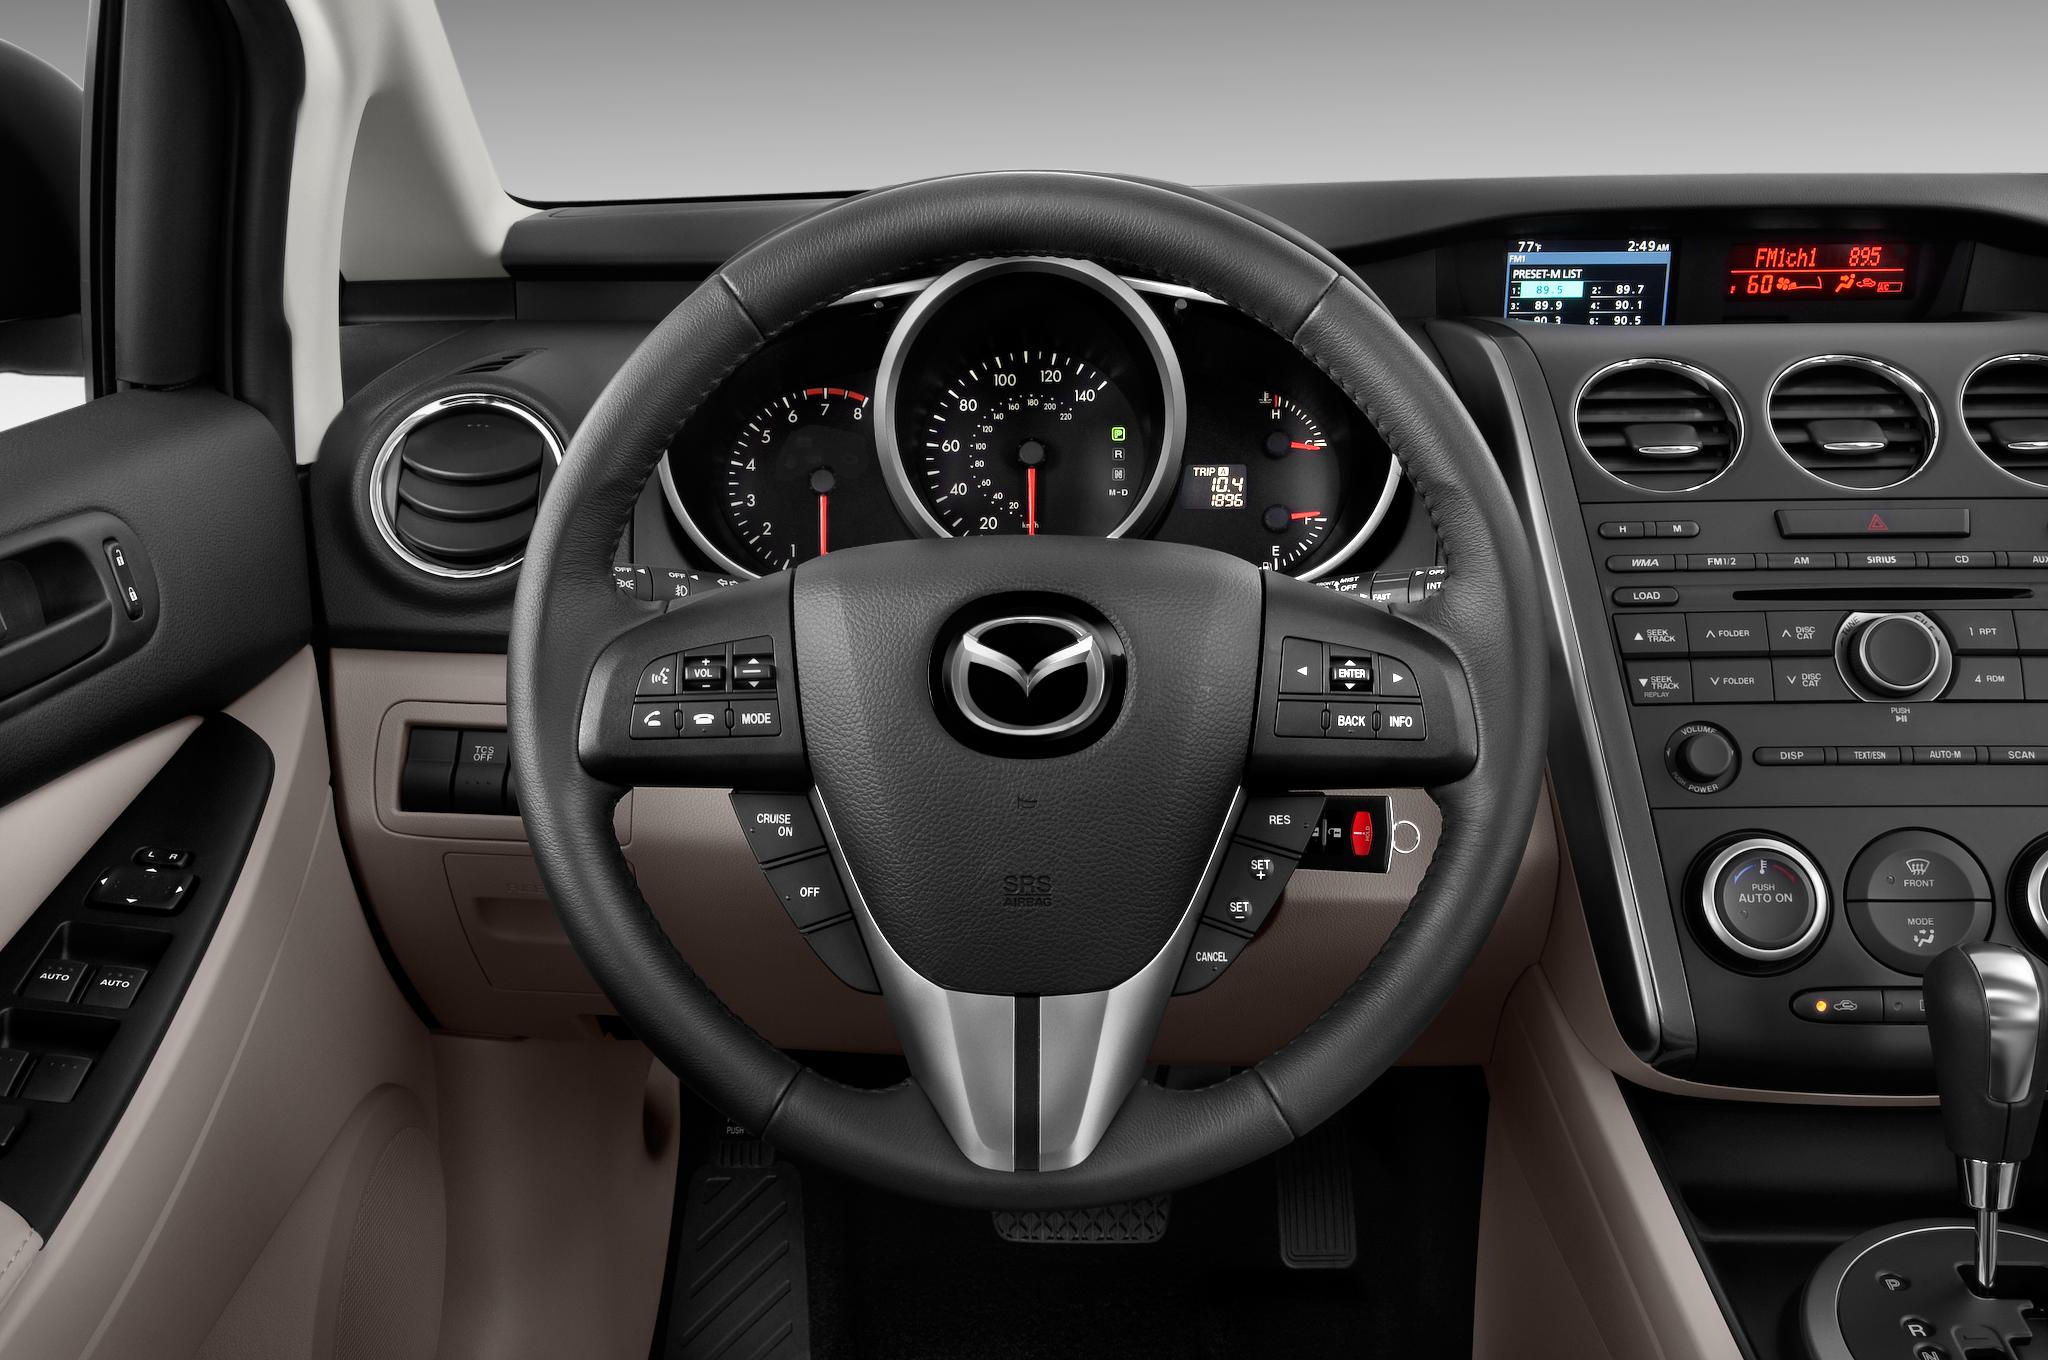 http://st.automobilemag.com/uploads/sites/10/2015/11/2010-mazda-cx7-i-sport-suv-steering-wheel.png